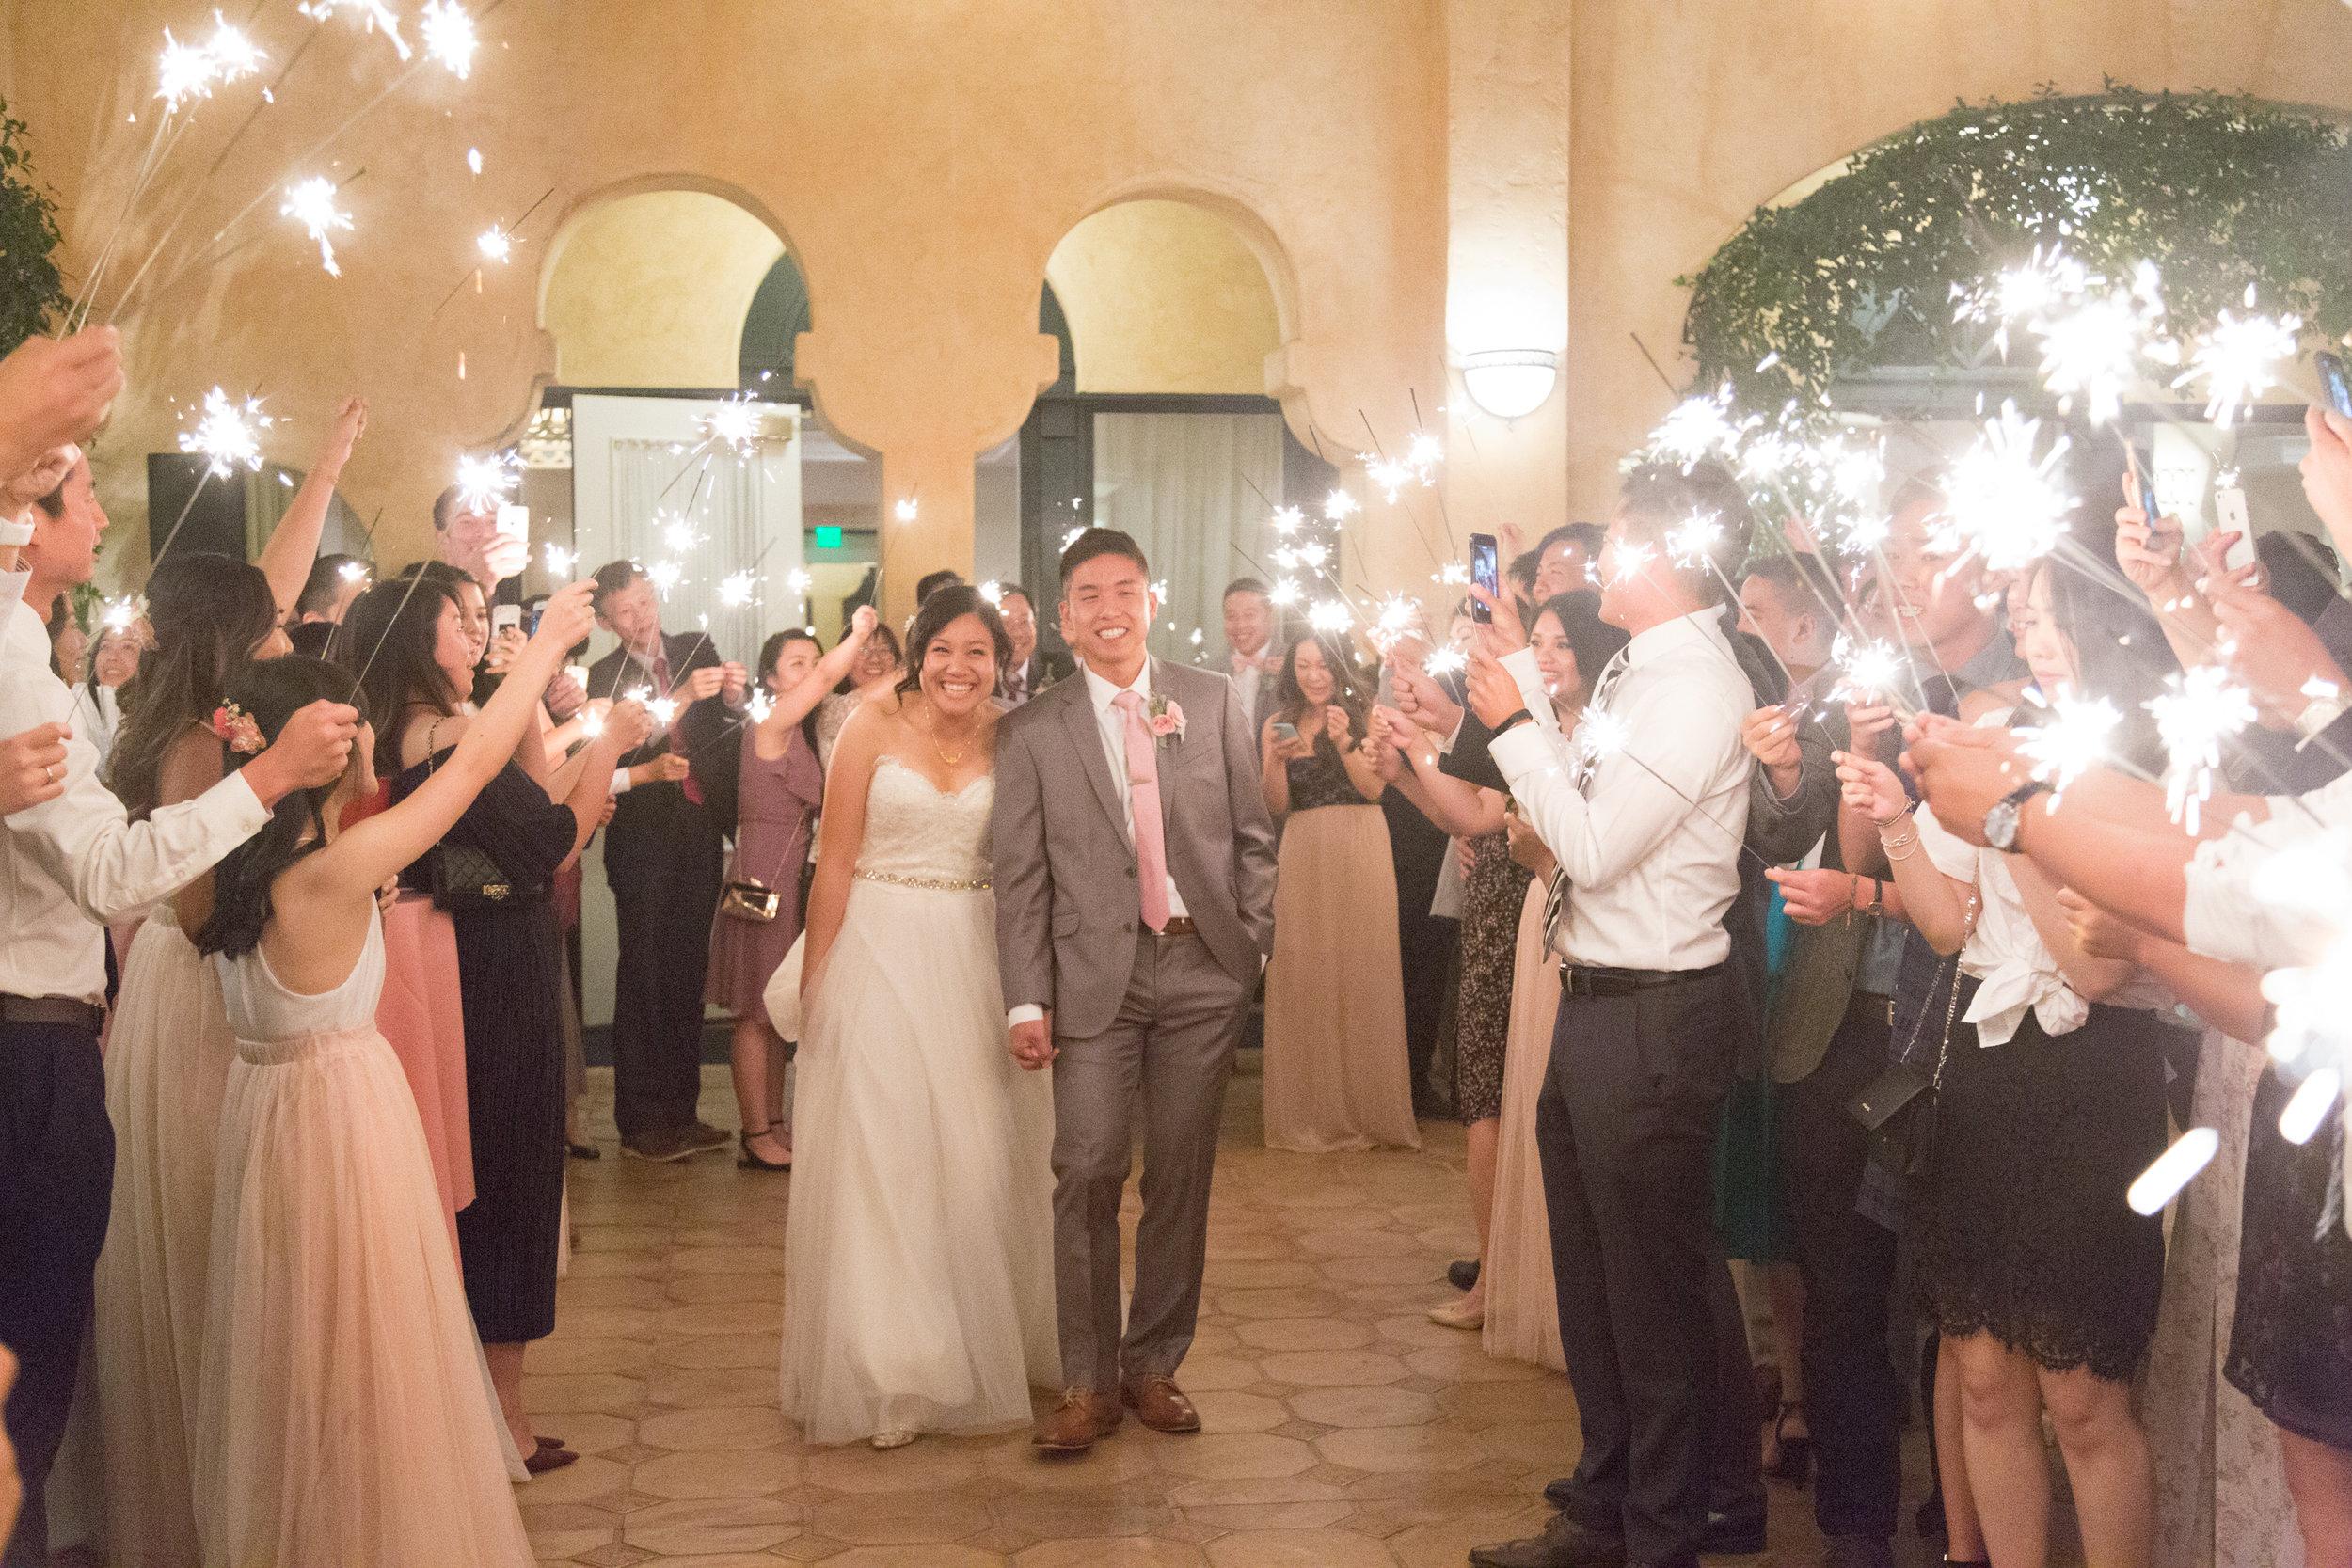 trynhphoto_wedding_photography_Standford_PaloAlto_SF_BayArea_Destination_OC_HA-572.jpg